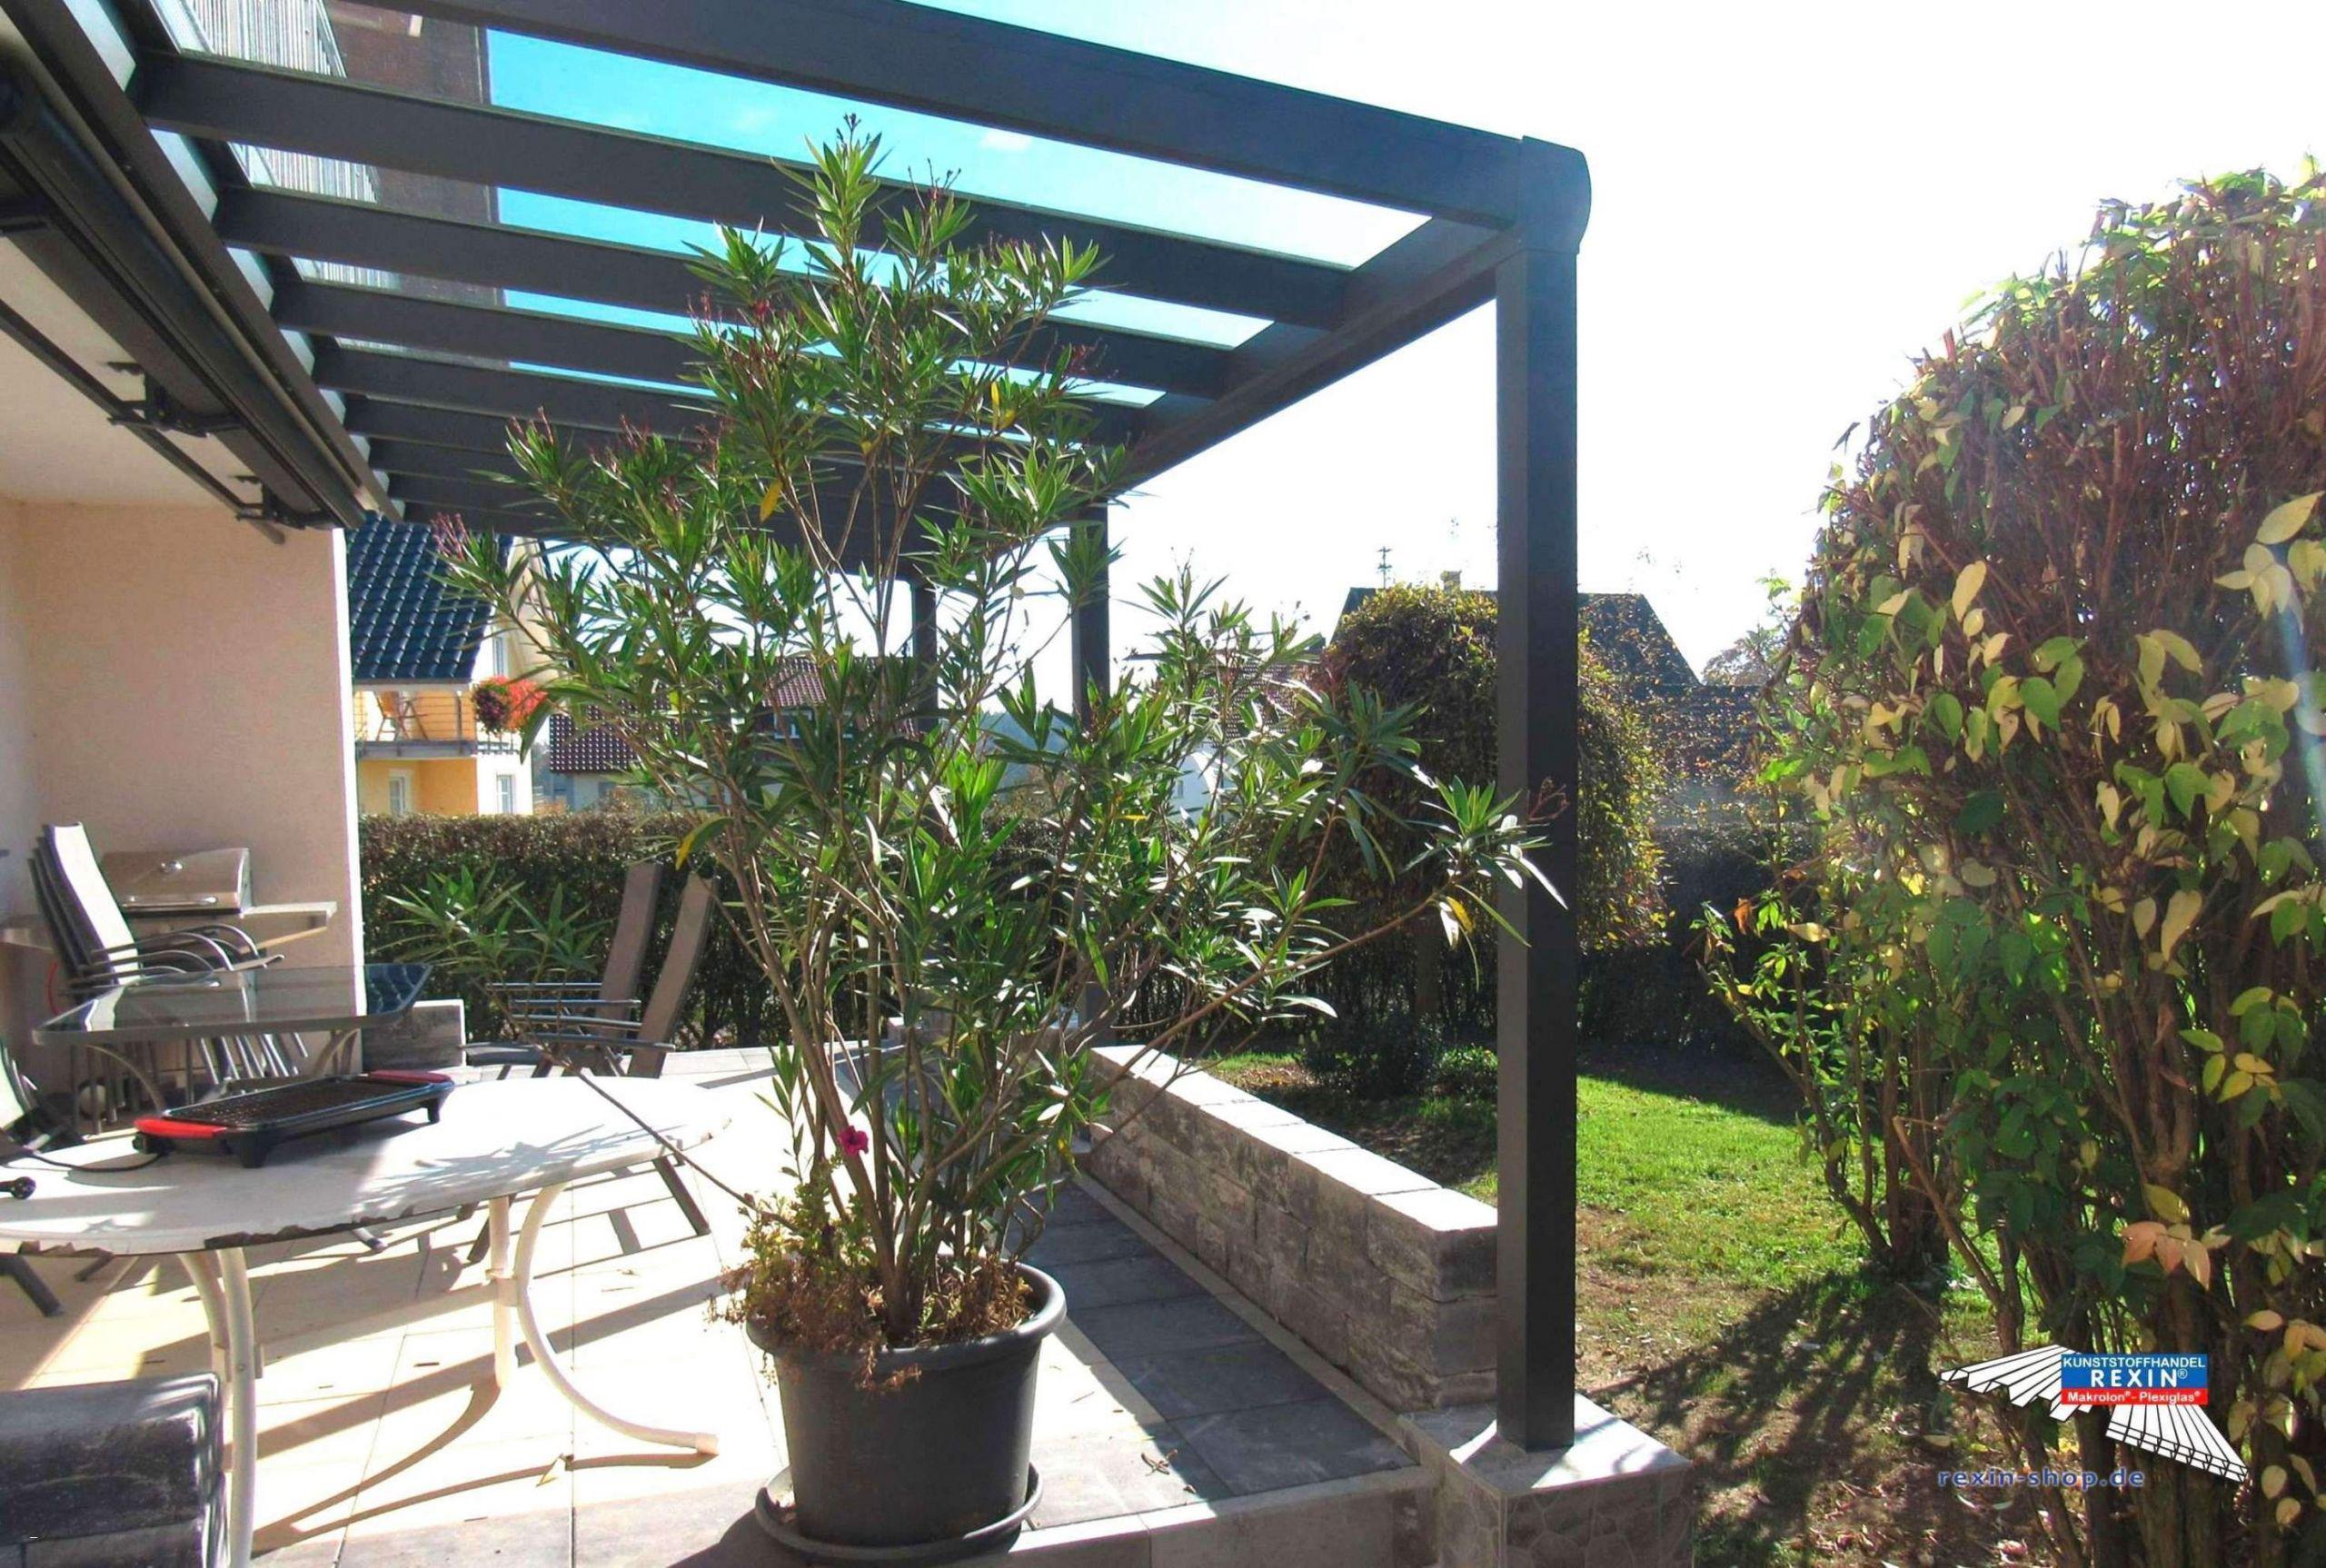 sonnenschutz garten elegant terassen ideen genial balkon ideen luxus sonnenschutz garten terrasse sonnenschutz garten terrasse